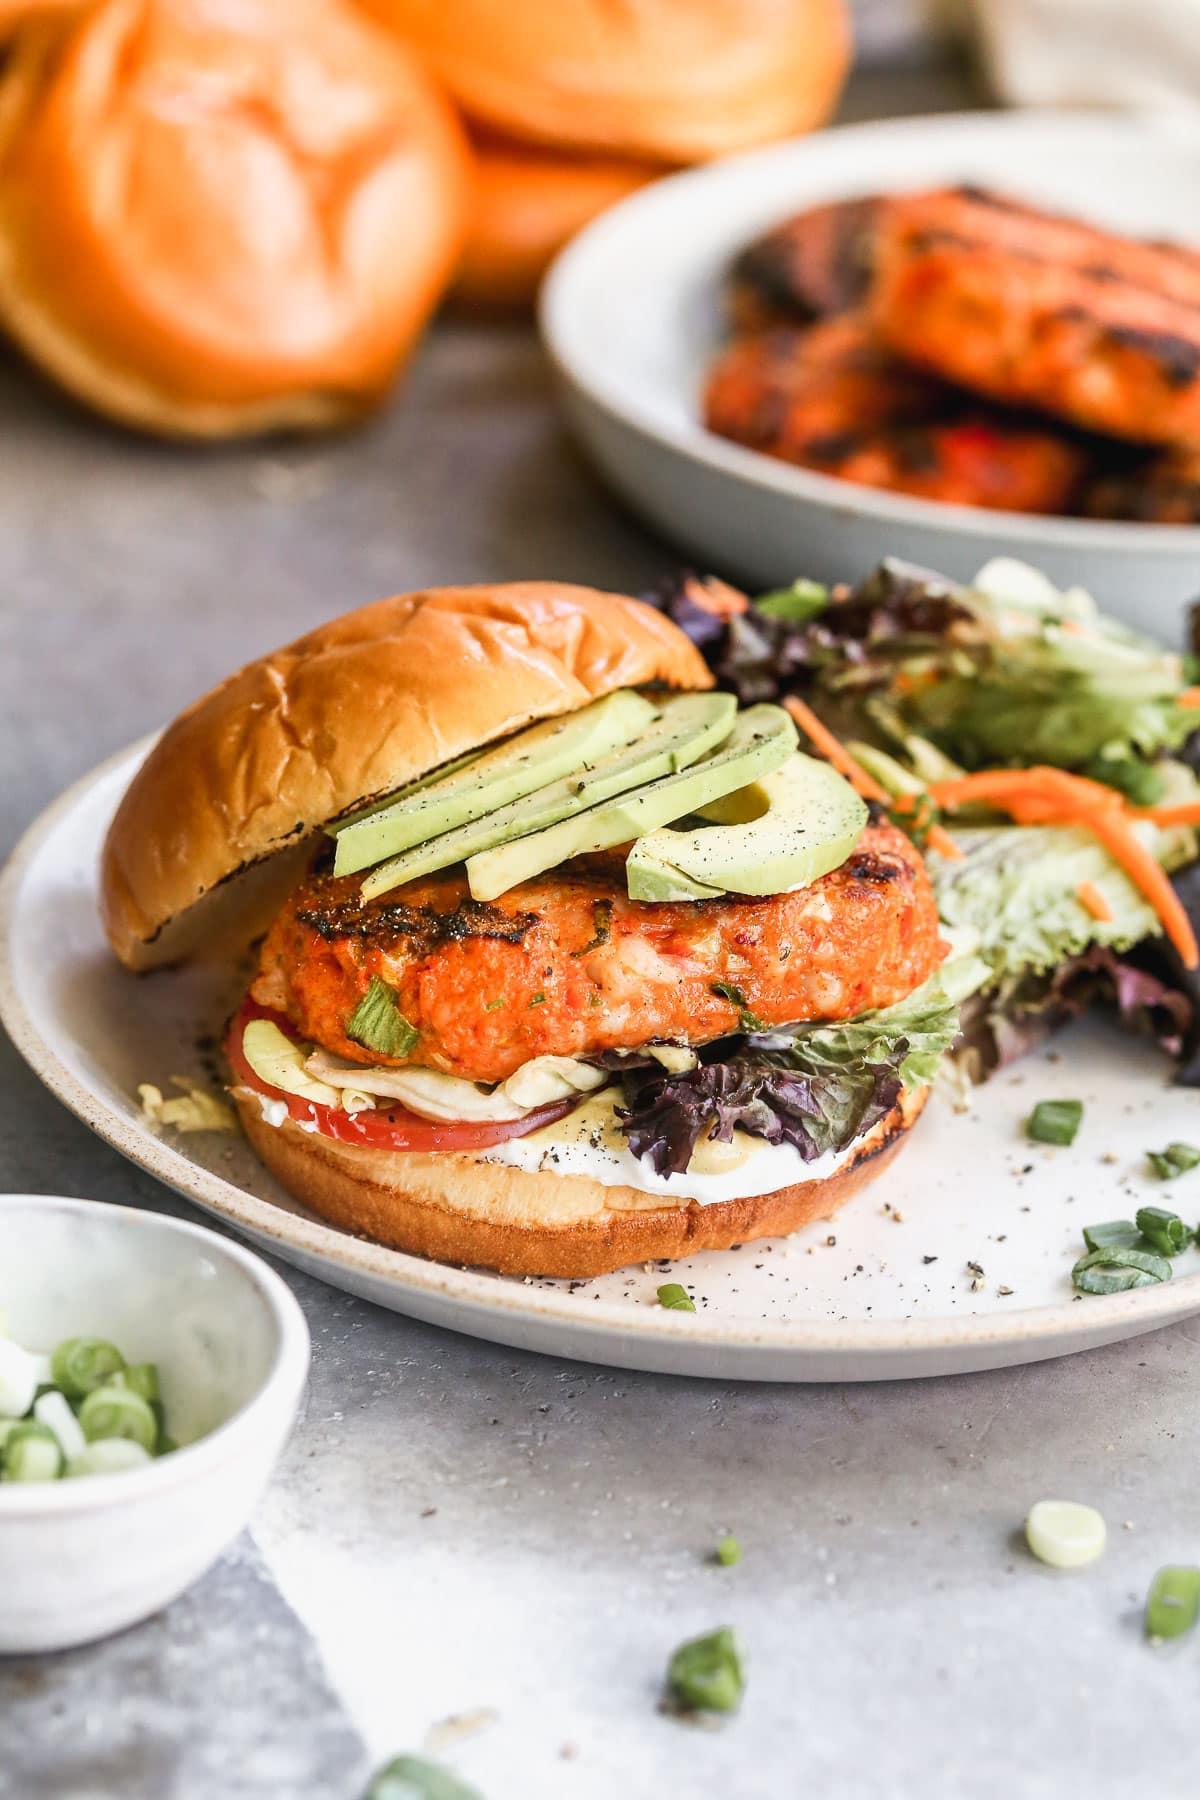 spicy shrimp burger with avocado